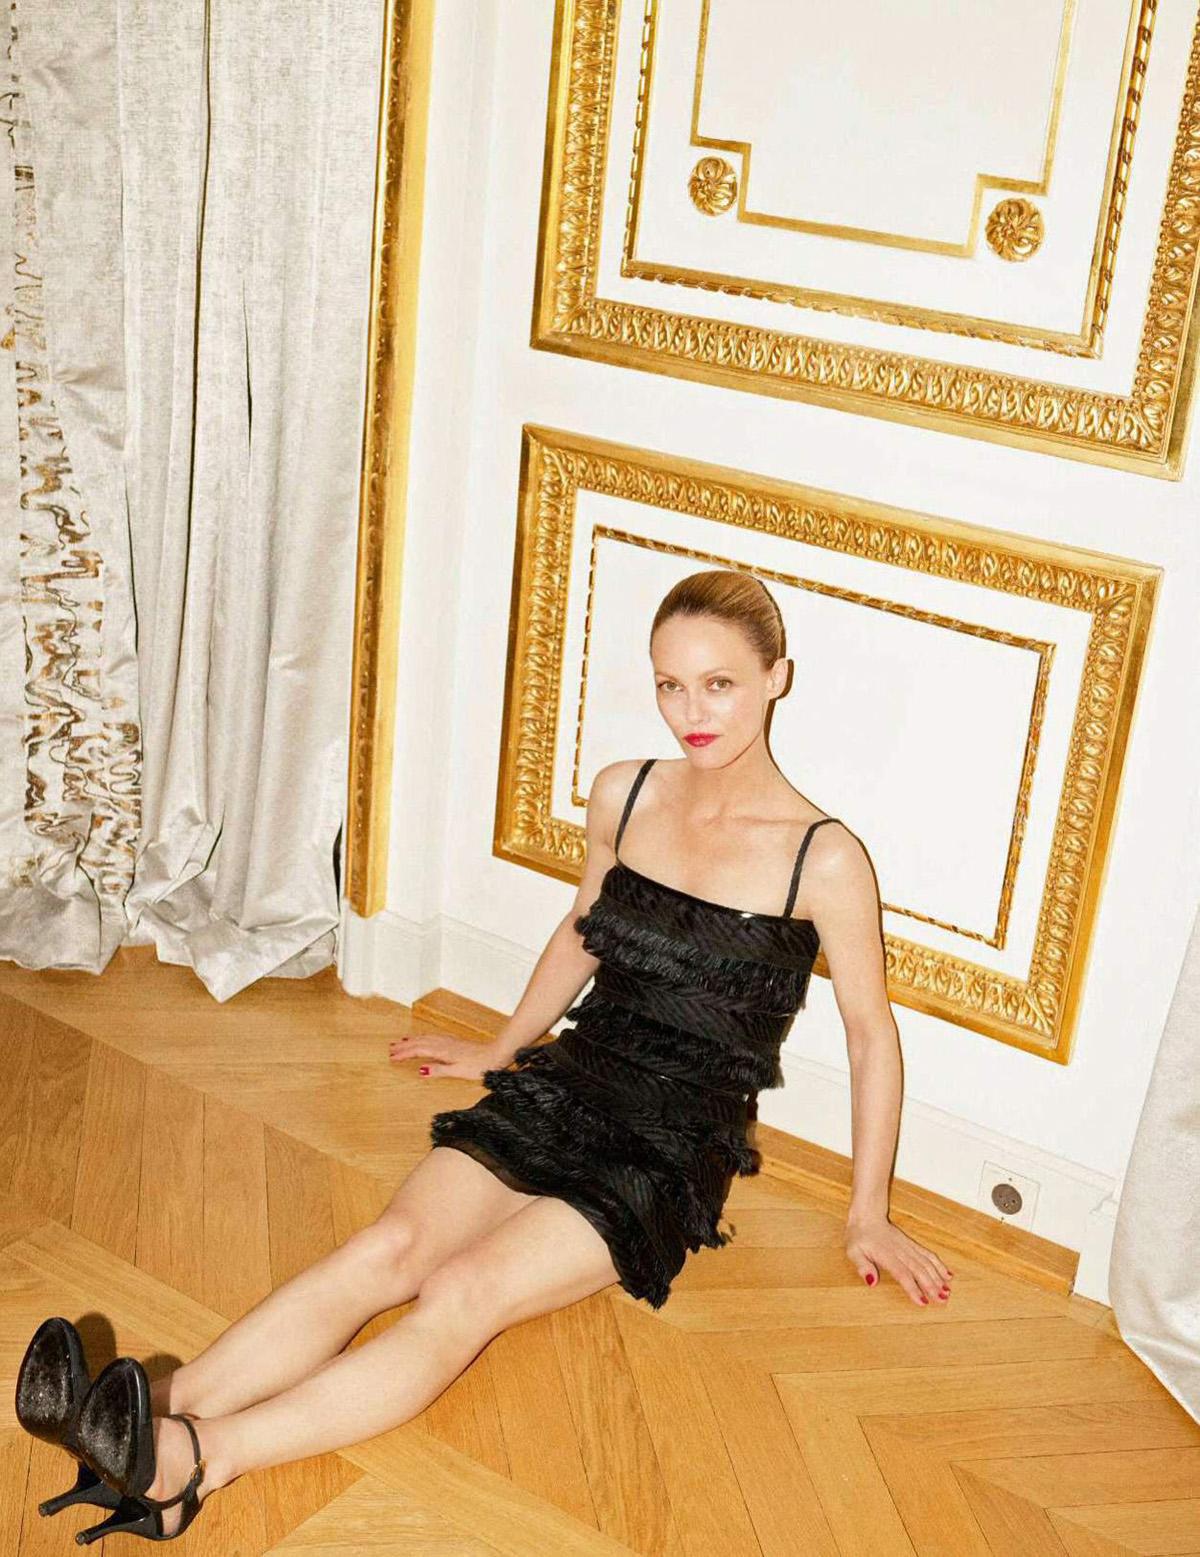 Vanessa Paradis covers Elle France September 10th, 2021 by Karim Sadli